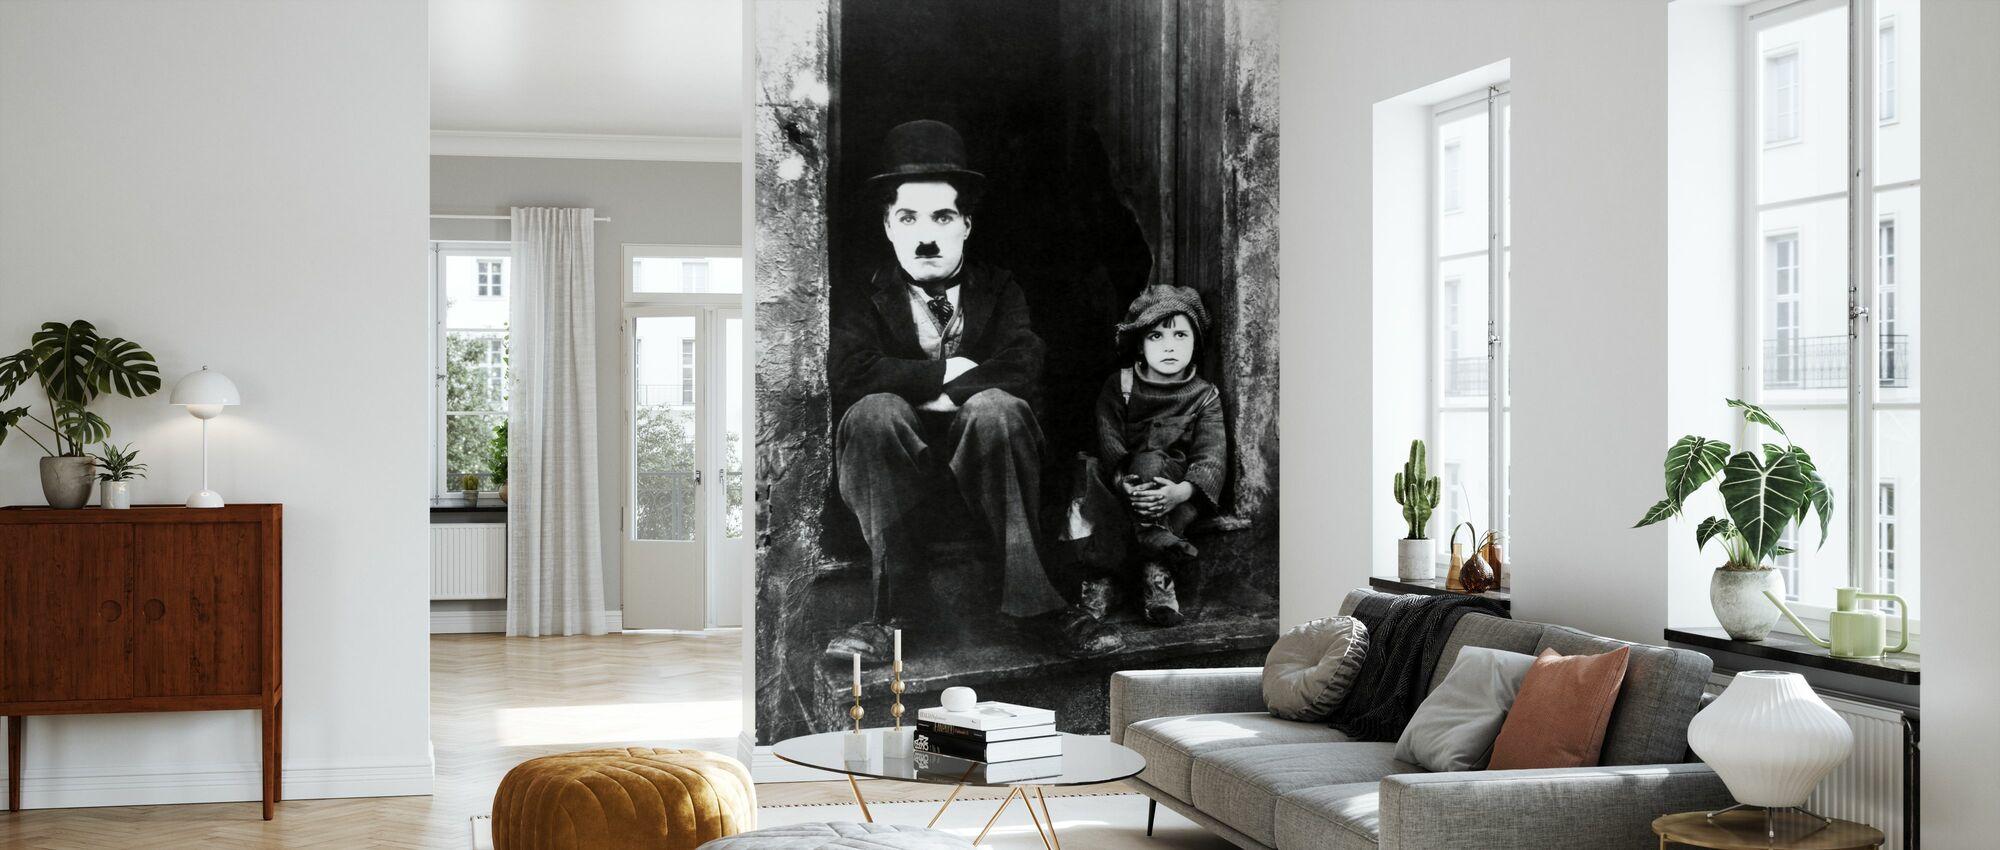 Charlie Chaplin and Jackie Coogan - Wallpaper - Living Room